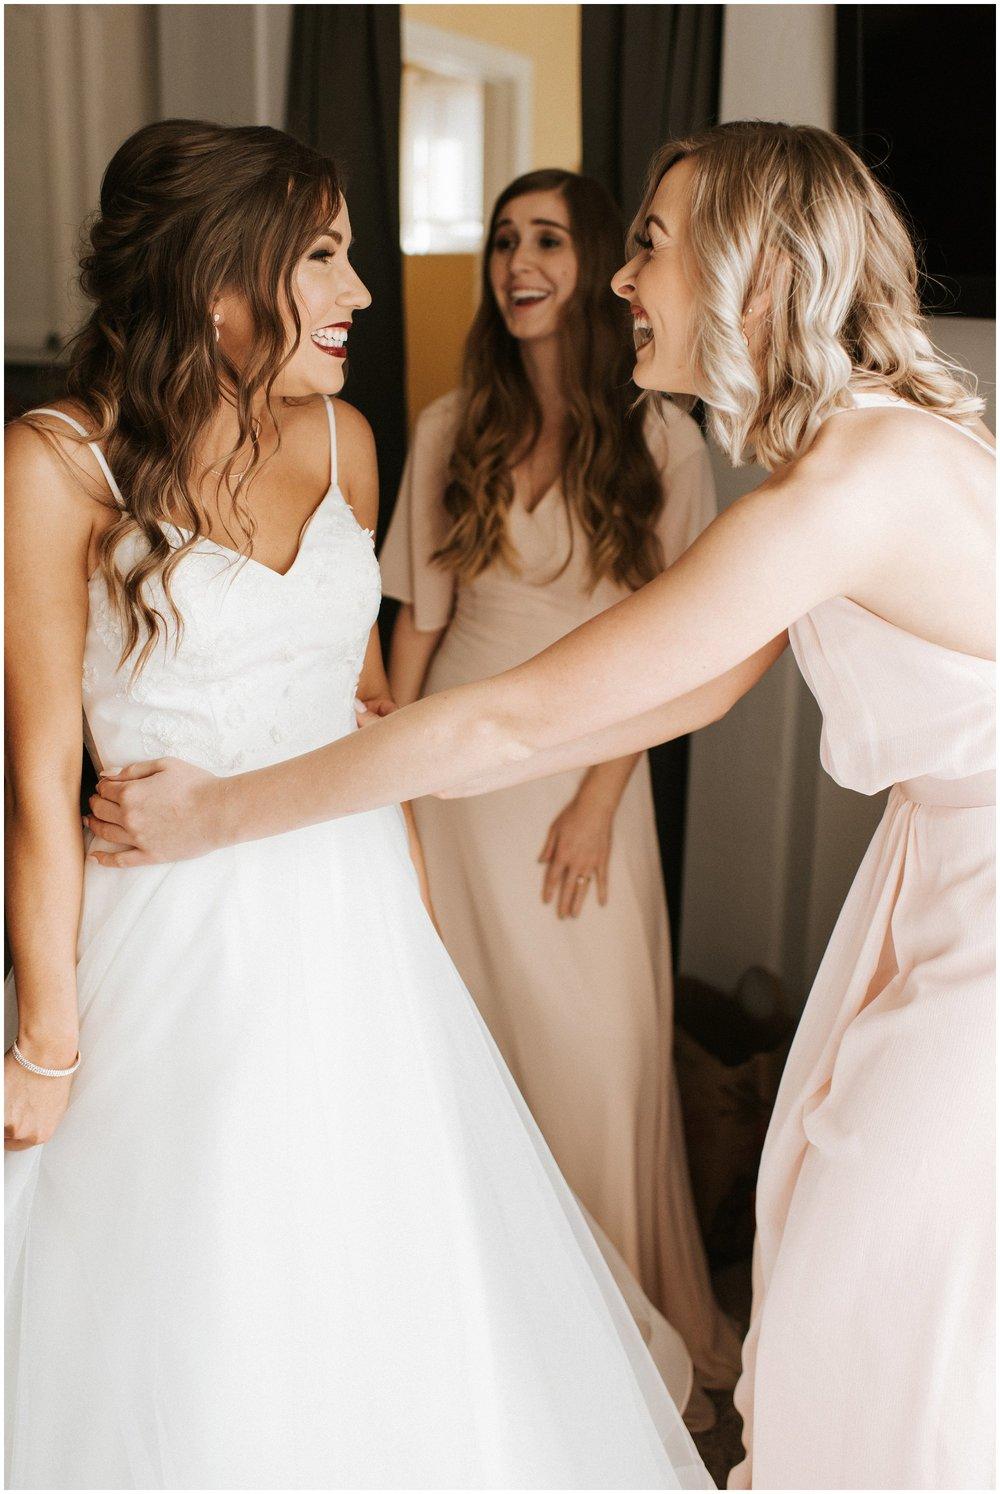 arizona same sex wedding photographer - jenni and lauren wedding the islands clubhouse_0016.jpg